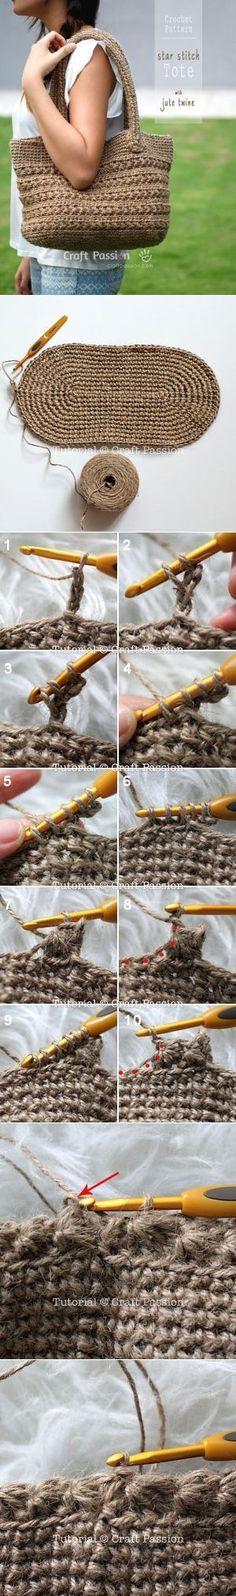 Crochet | Star Stitch Tote With Jute Twine | Free Pattern...